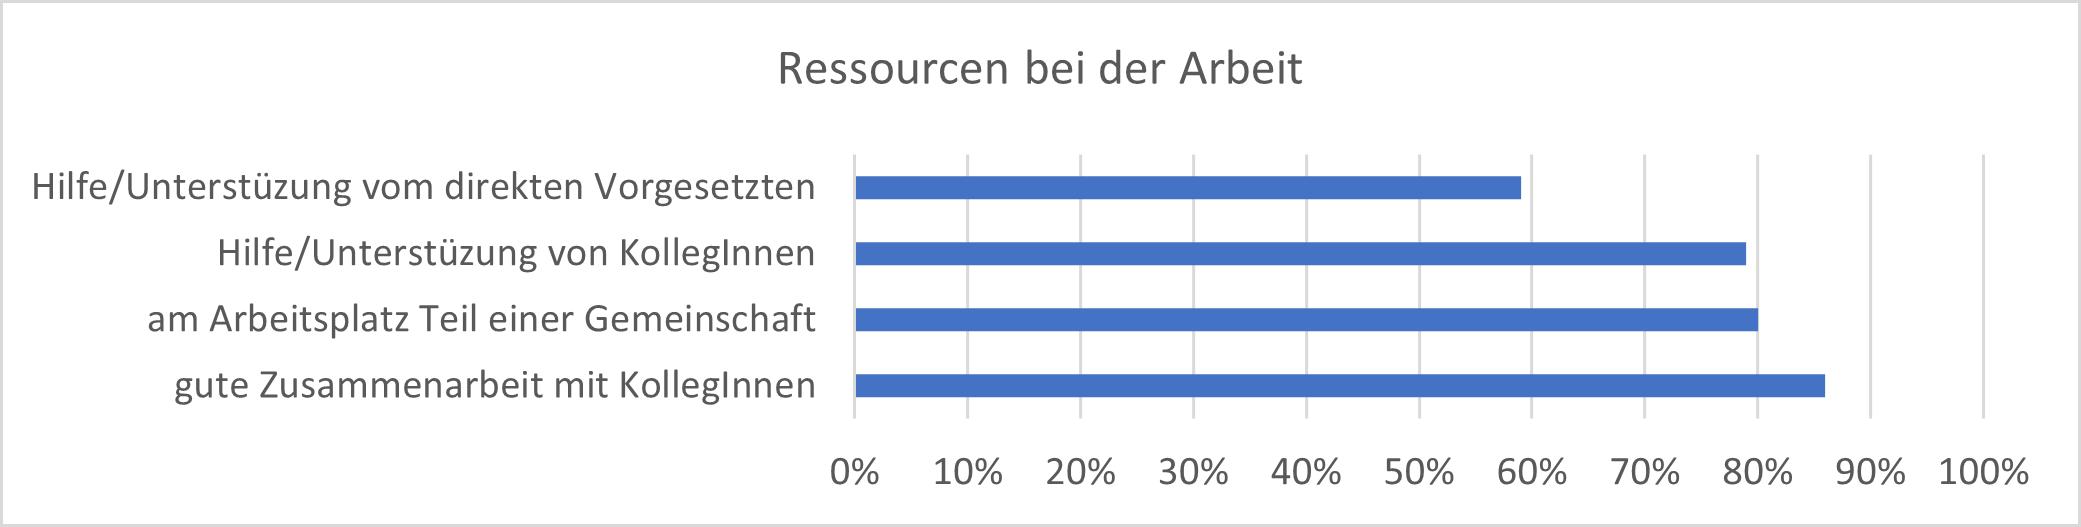 "Ausmaß der Ressource ""Soziale Unterstützung"" im Betrieb (BAuA,2020b)"